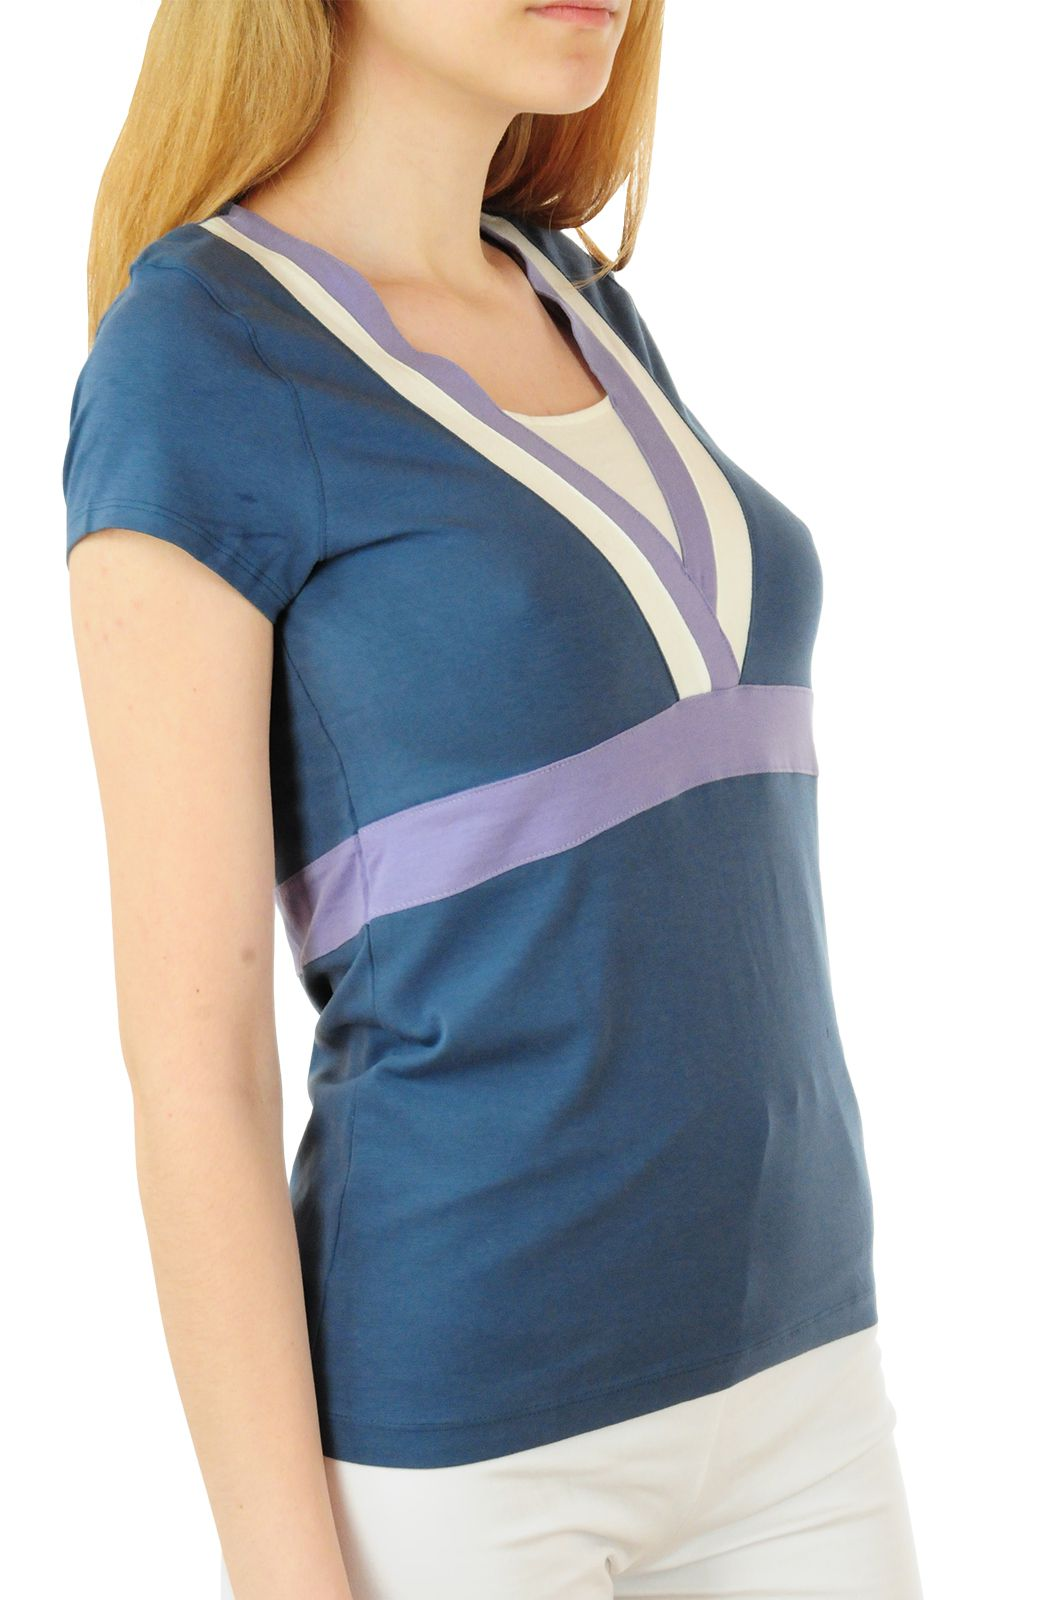 Эксклюзивная футболка Bossini® Yoga - вид сбоку